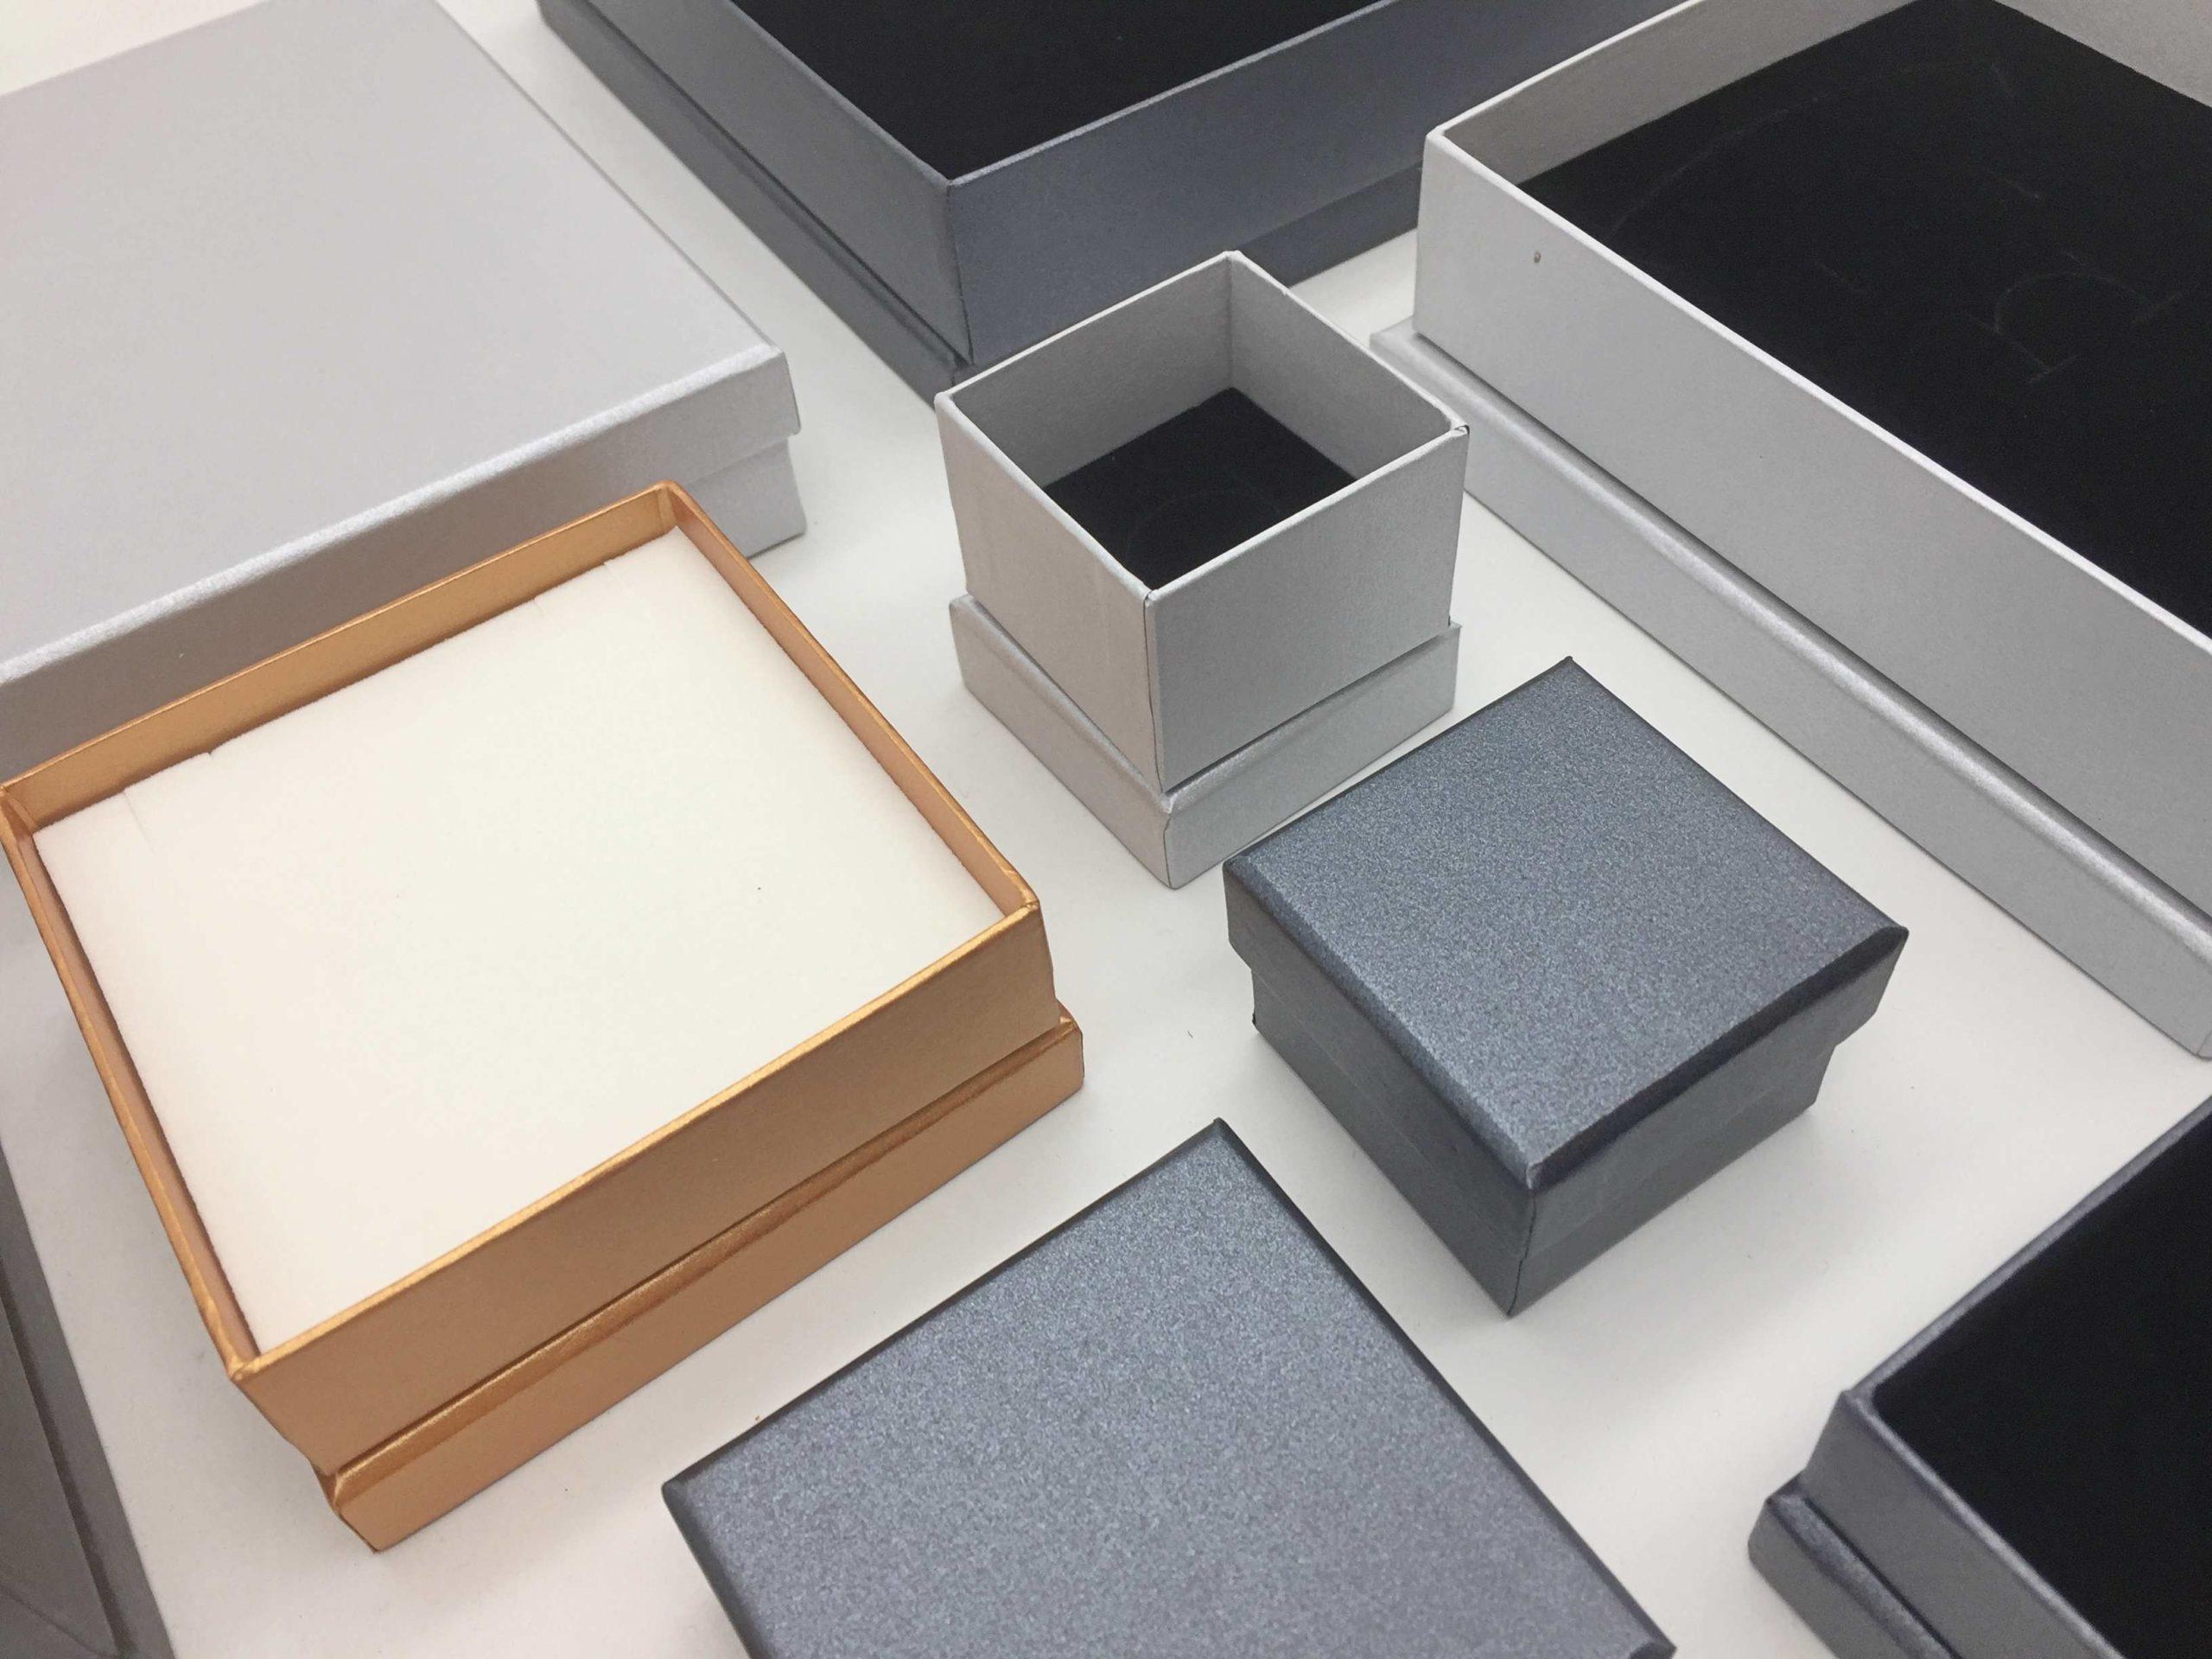 GloryBox - Cardboard Boxes